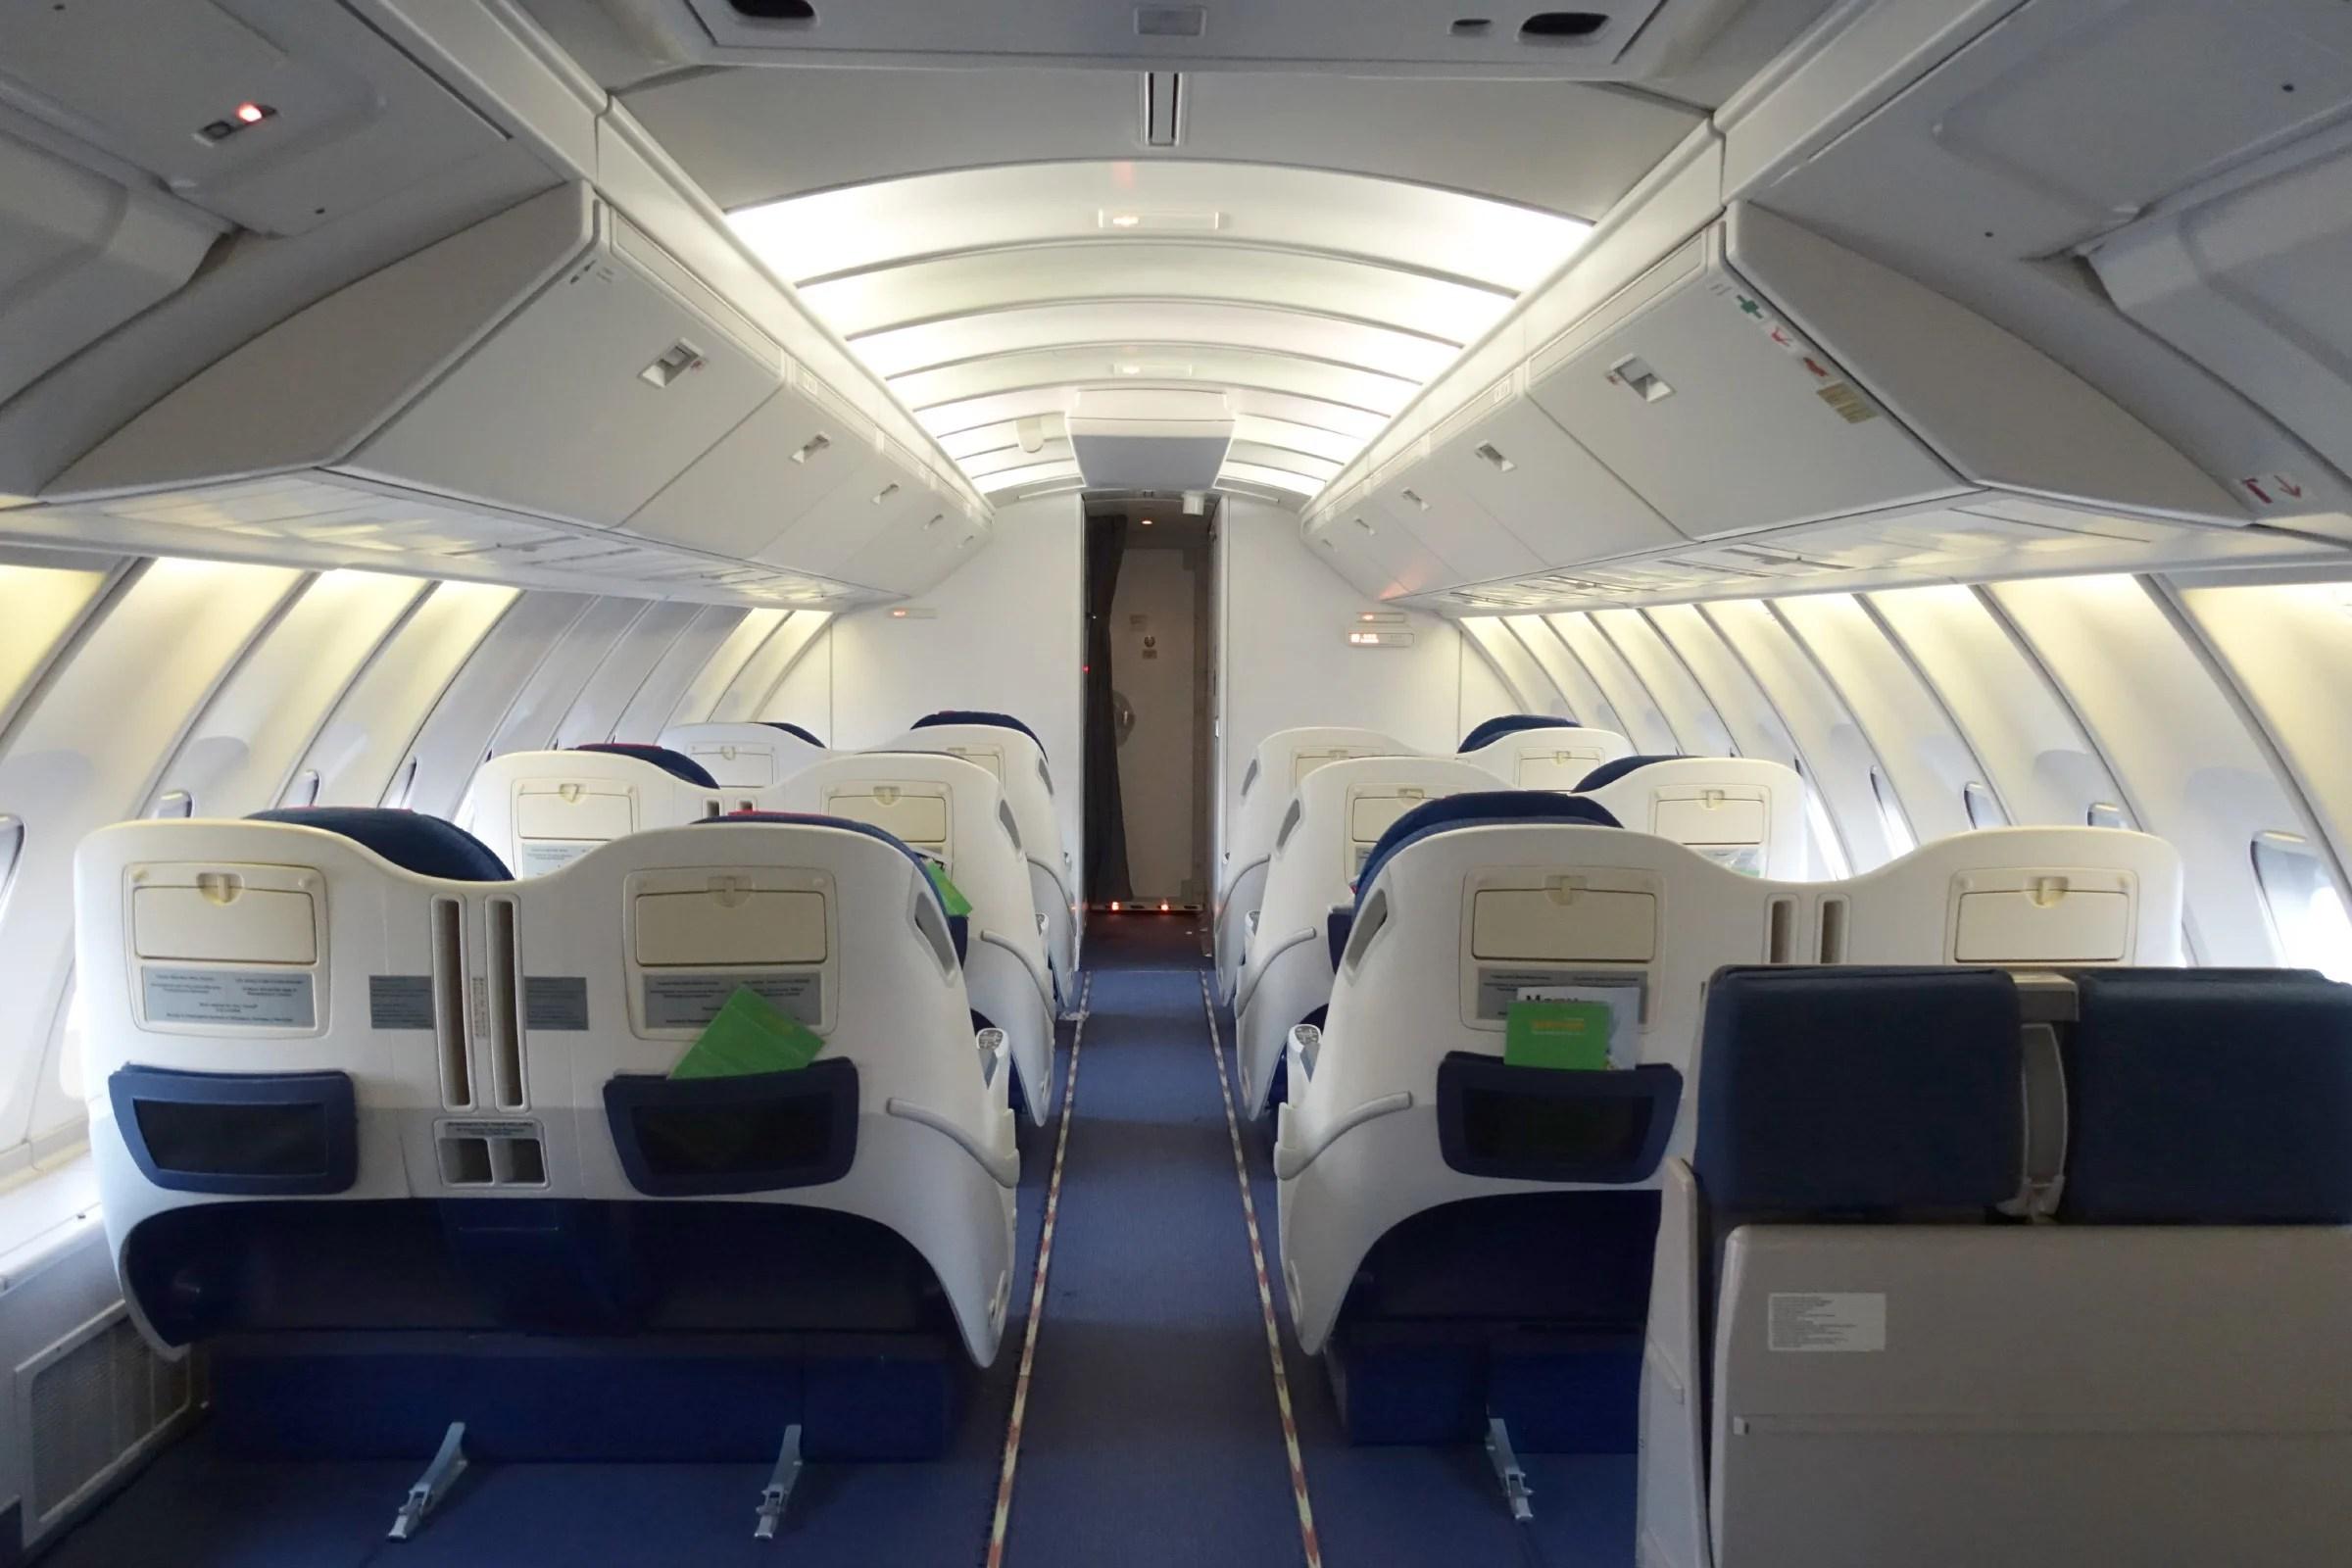 Review: Wamos Air 747 Business Class (Norwegian Premium)